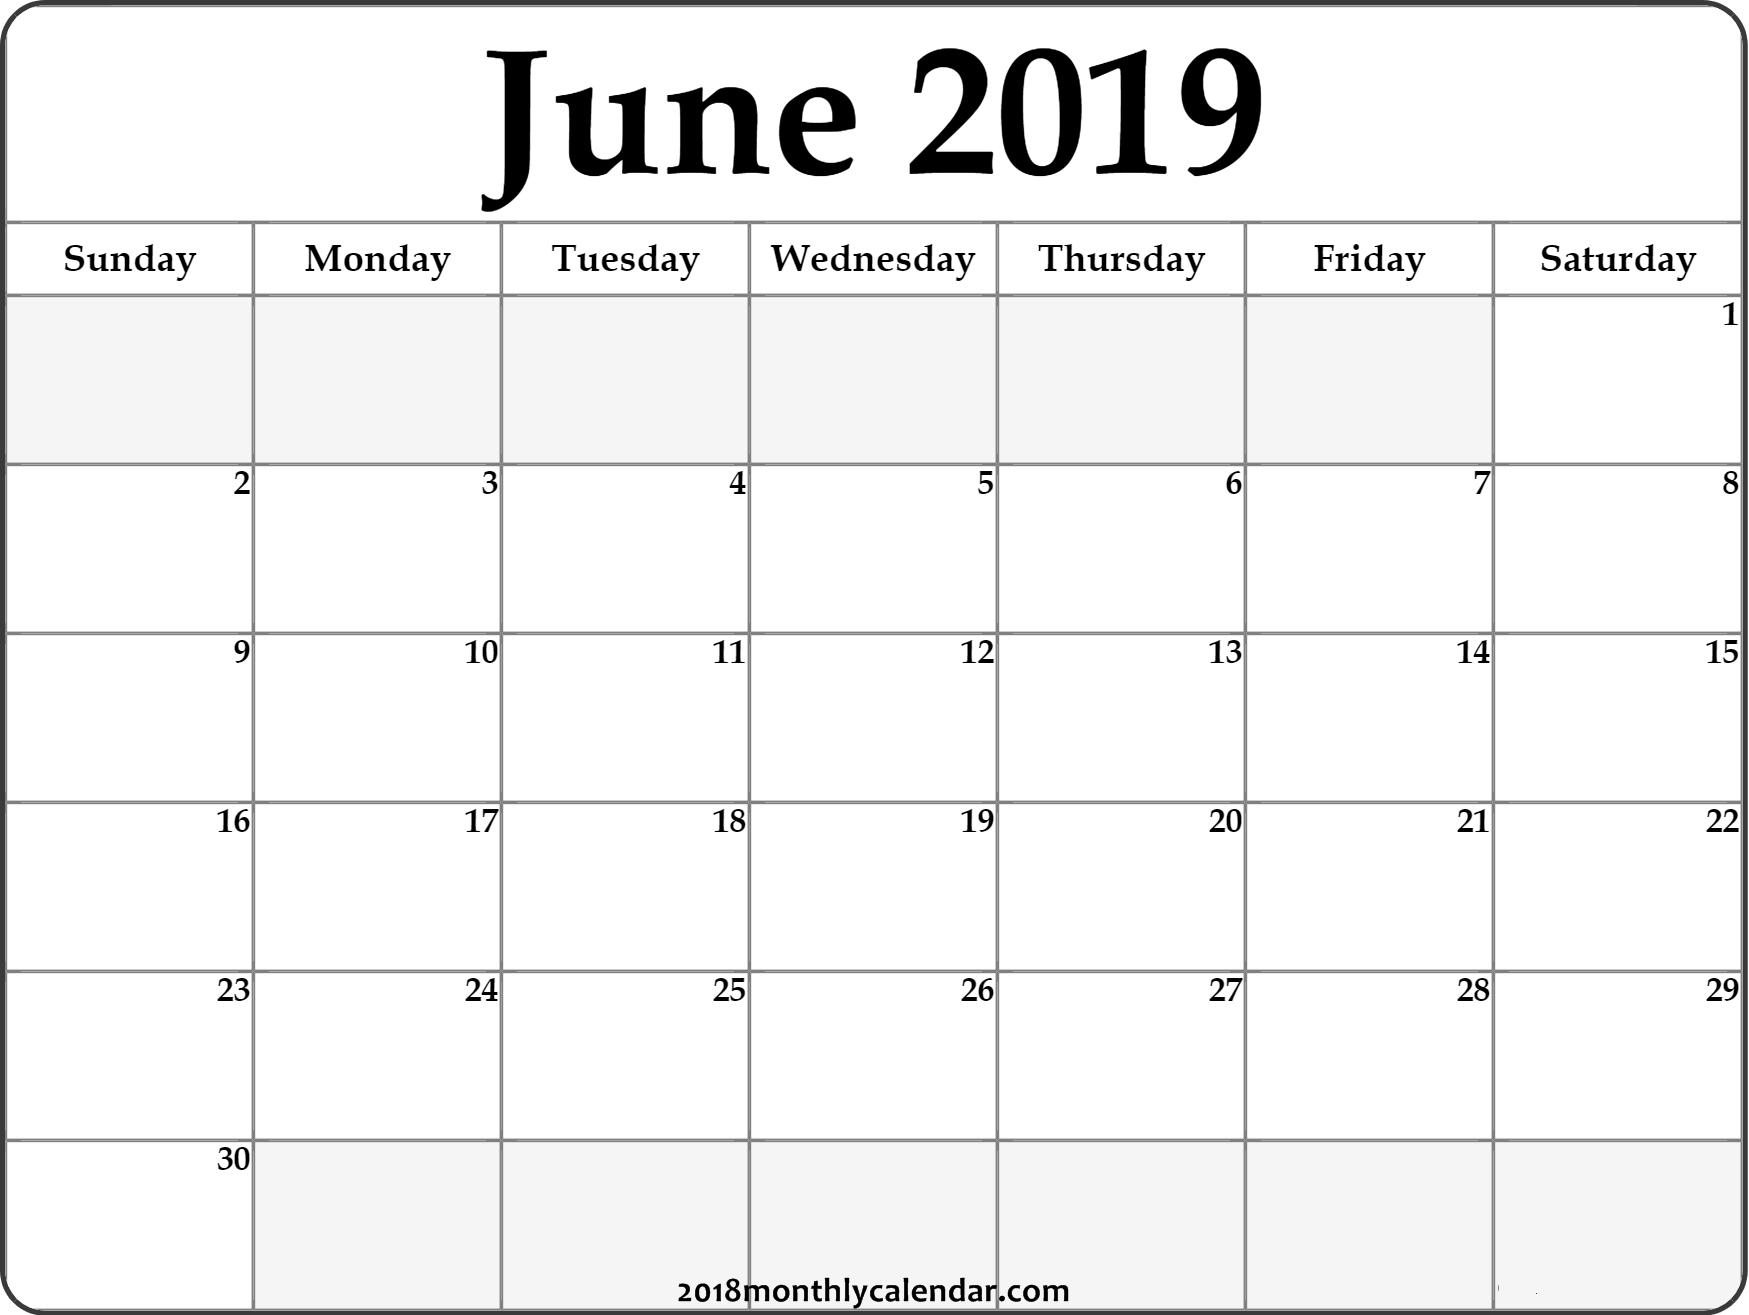 June Calendar 2019 #june #2019Calendar #june2019 #junecalendar in Free Printable Preschool Handprint Calendar Templates